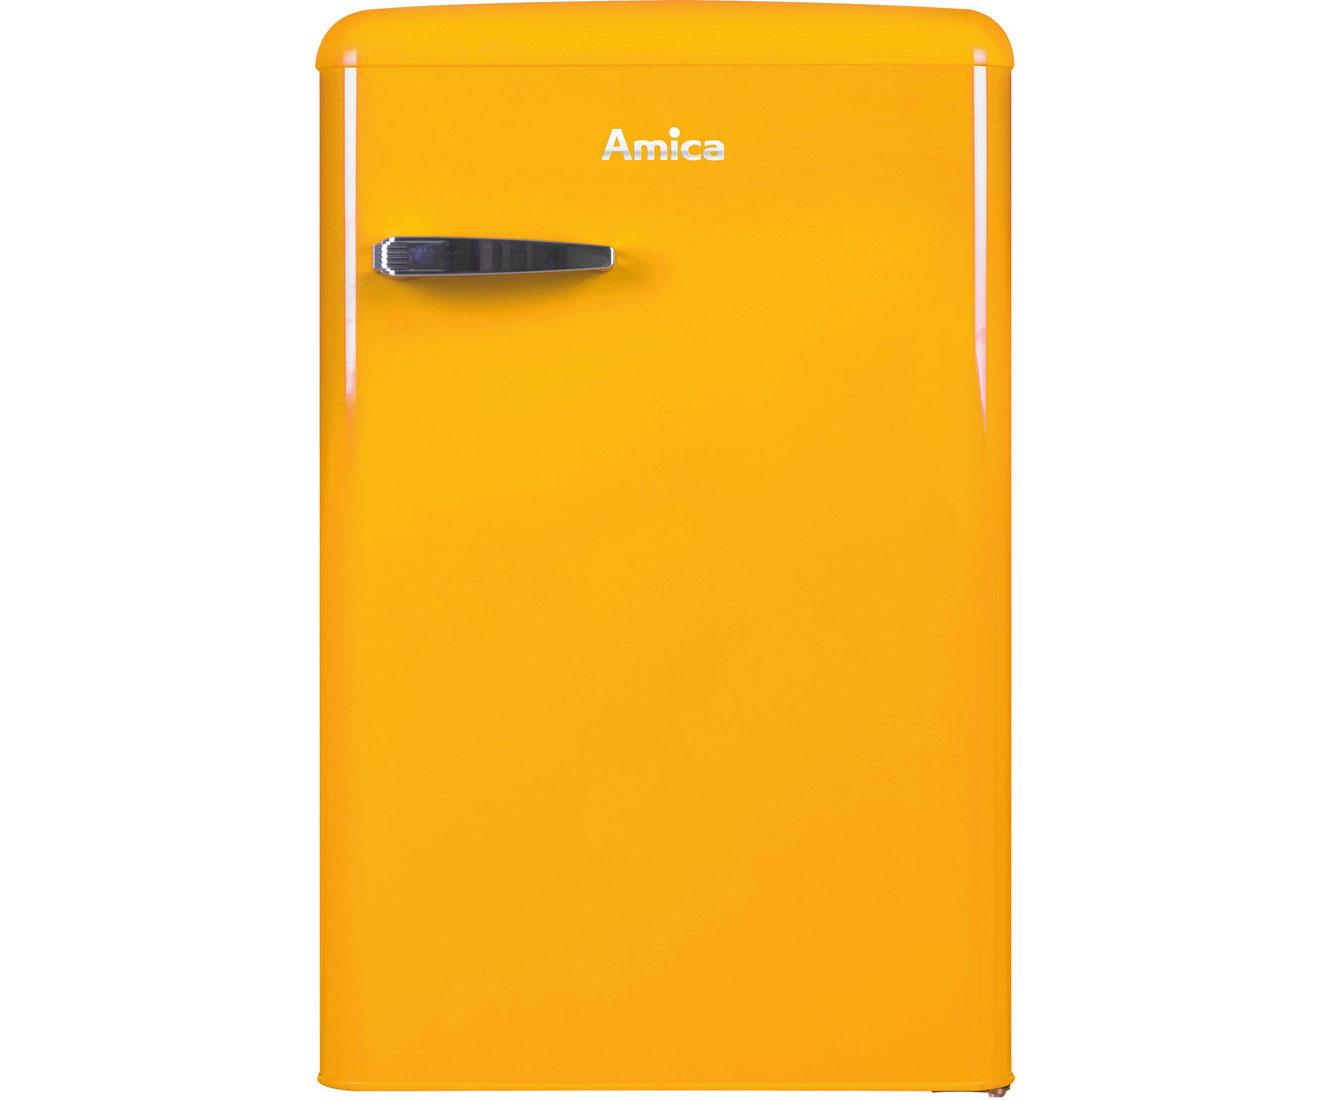 Retro Kühlschrank Klarstein : Klarstein retro kühlschrank bewertung klarstein retro kühlschrank